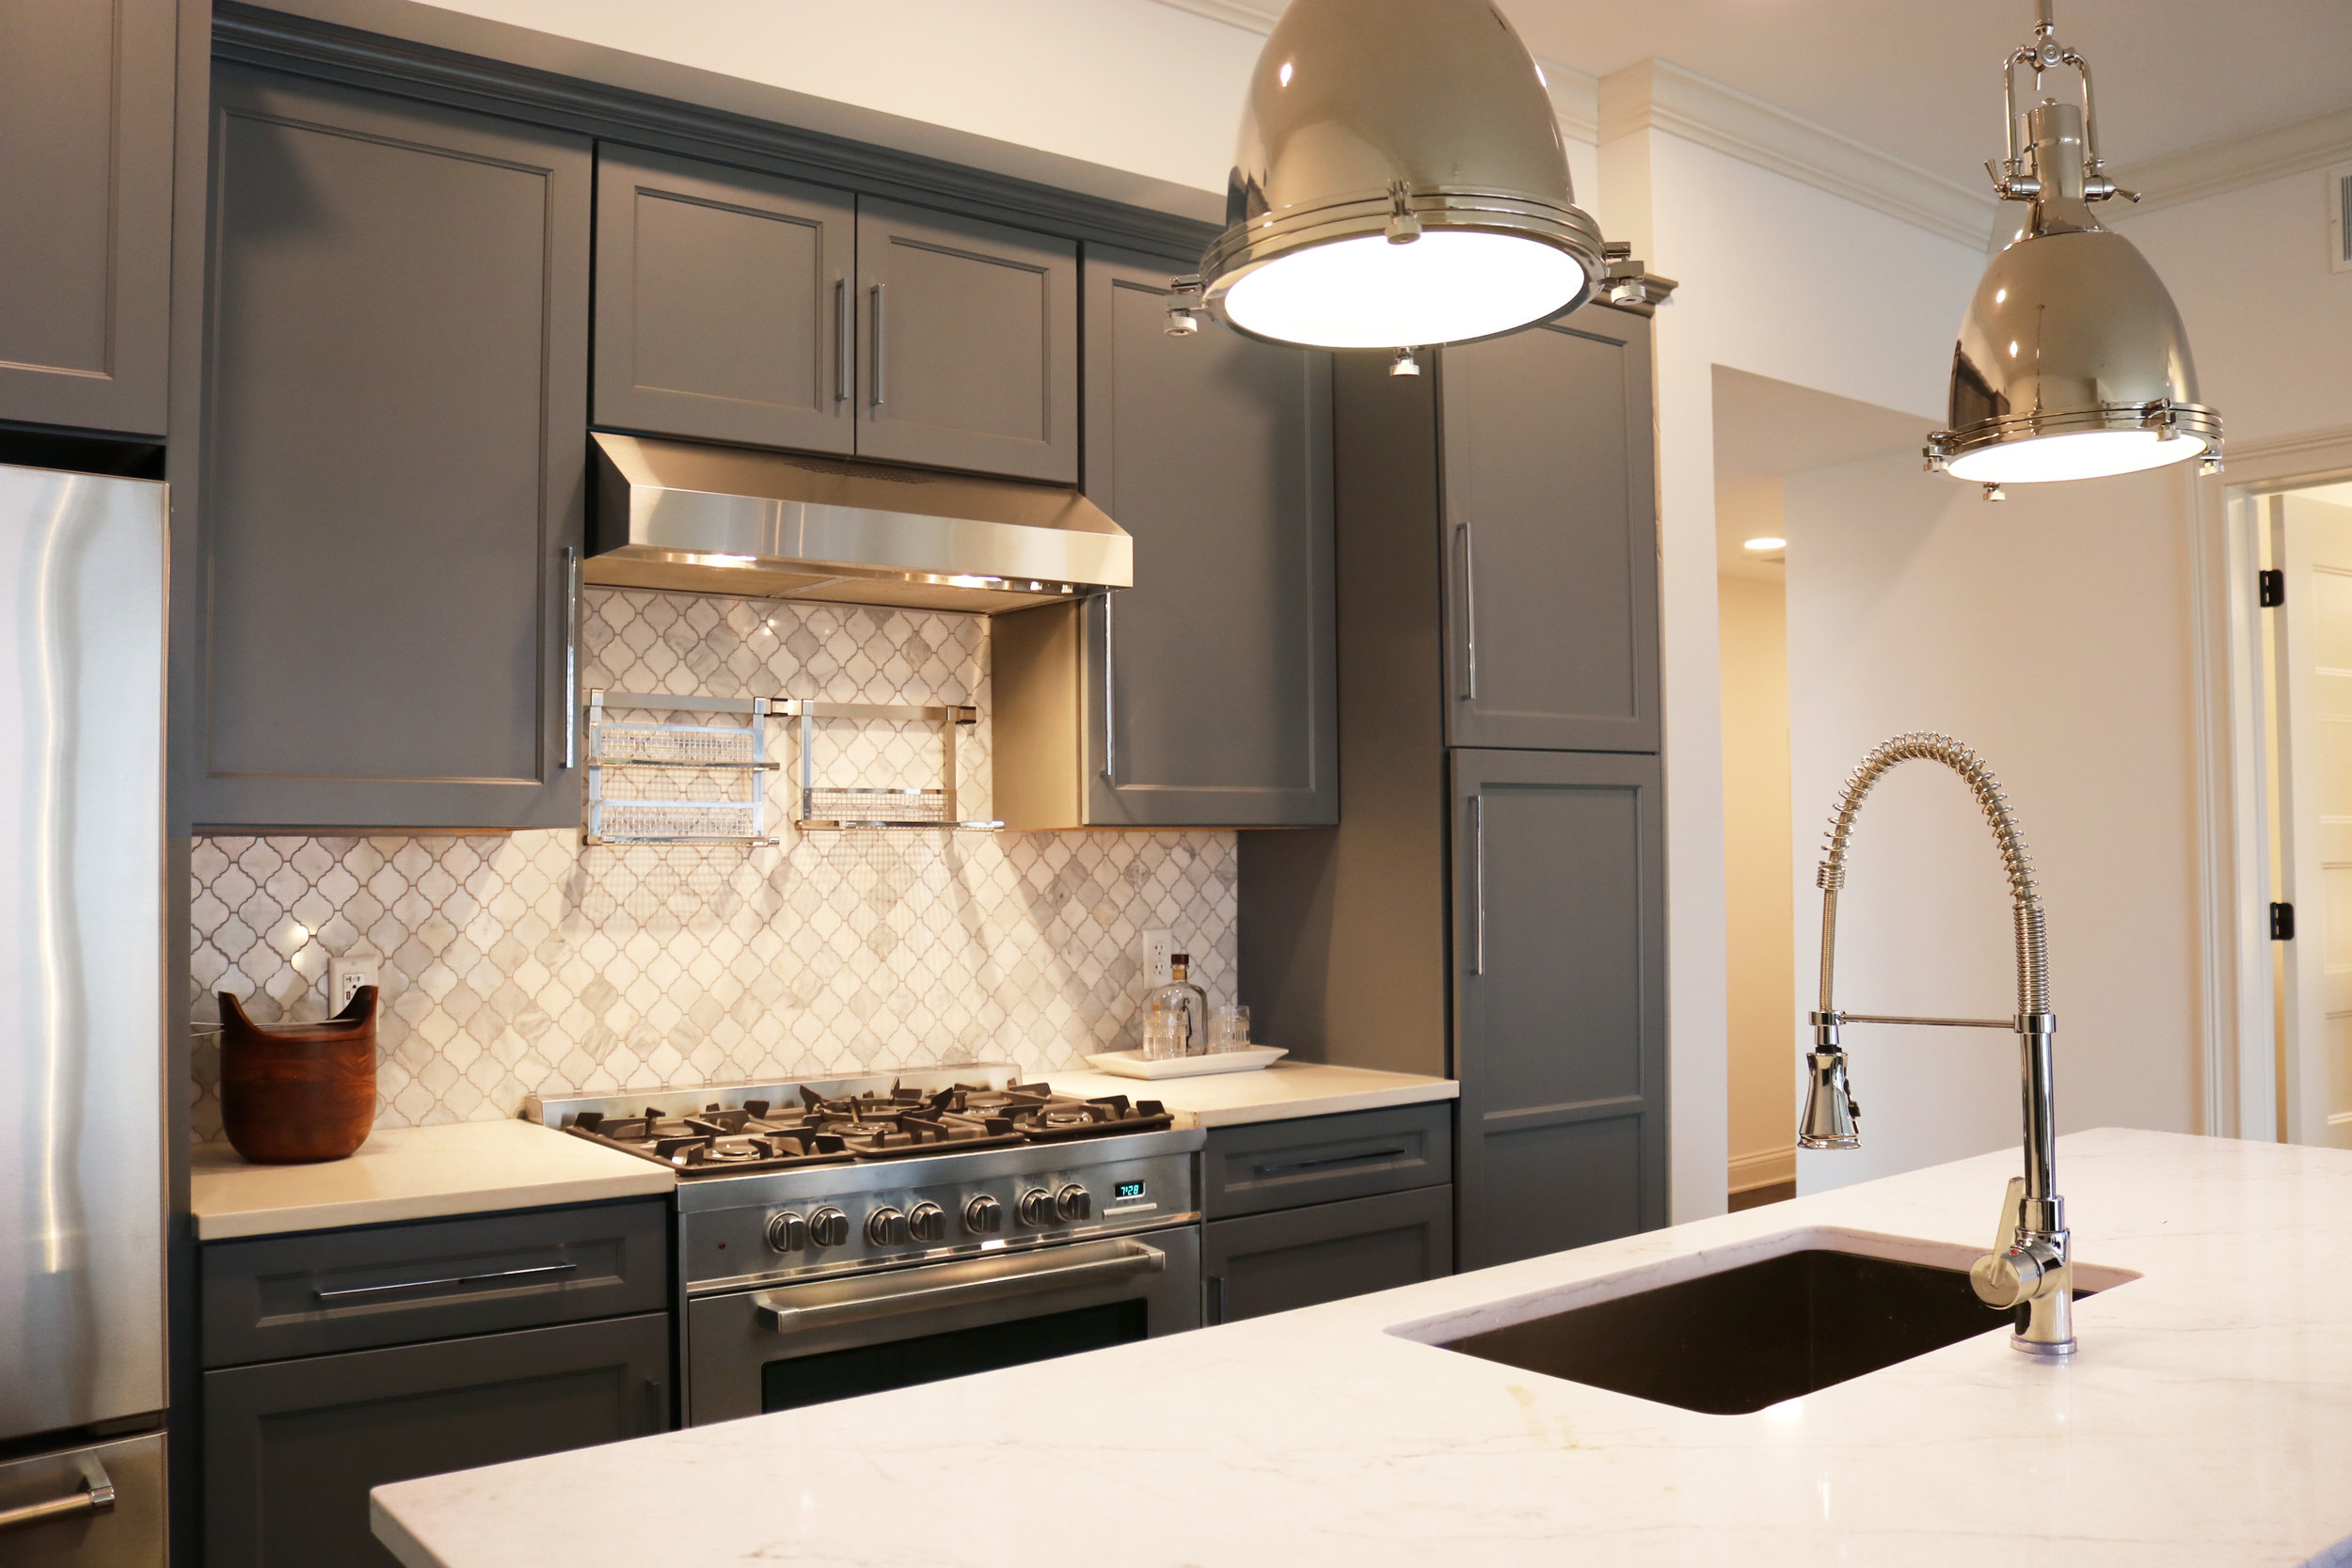 Brunner Building Apartment Kitchen 2 - Schooley Caldwell.jpg